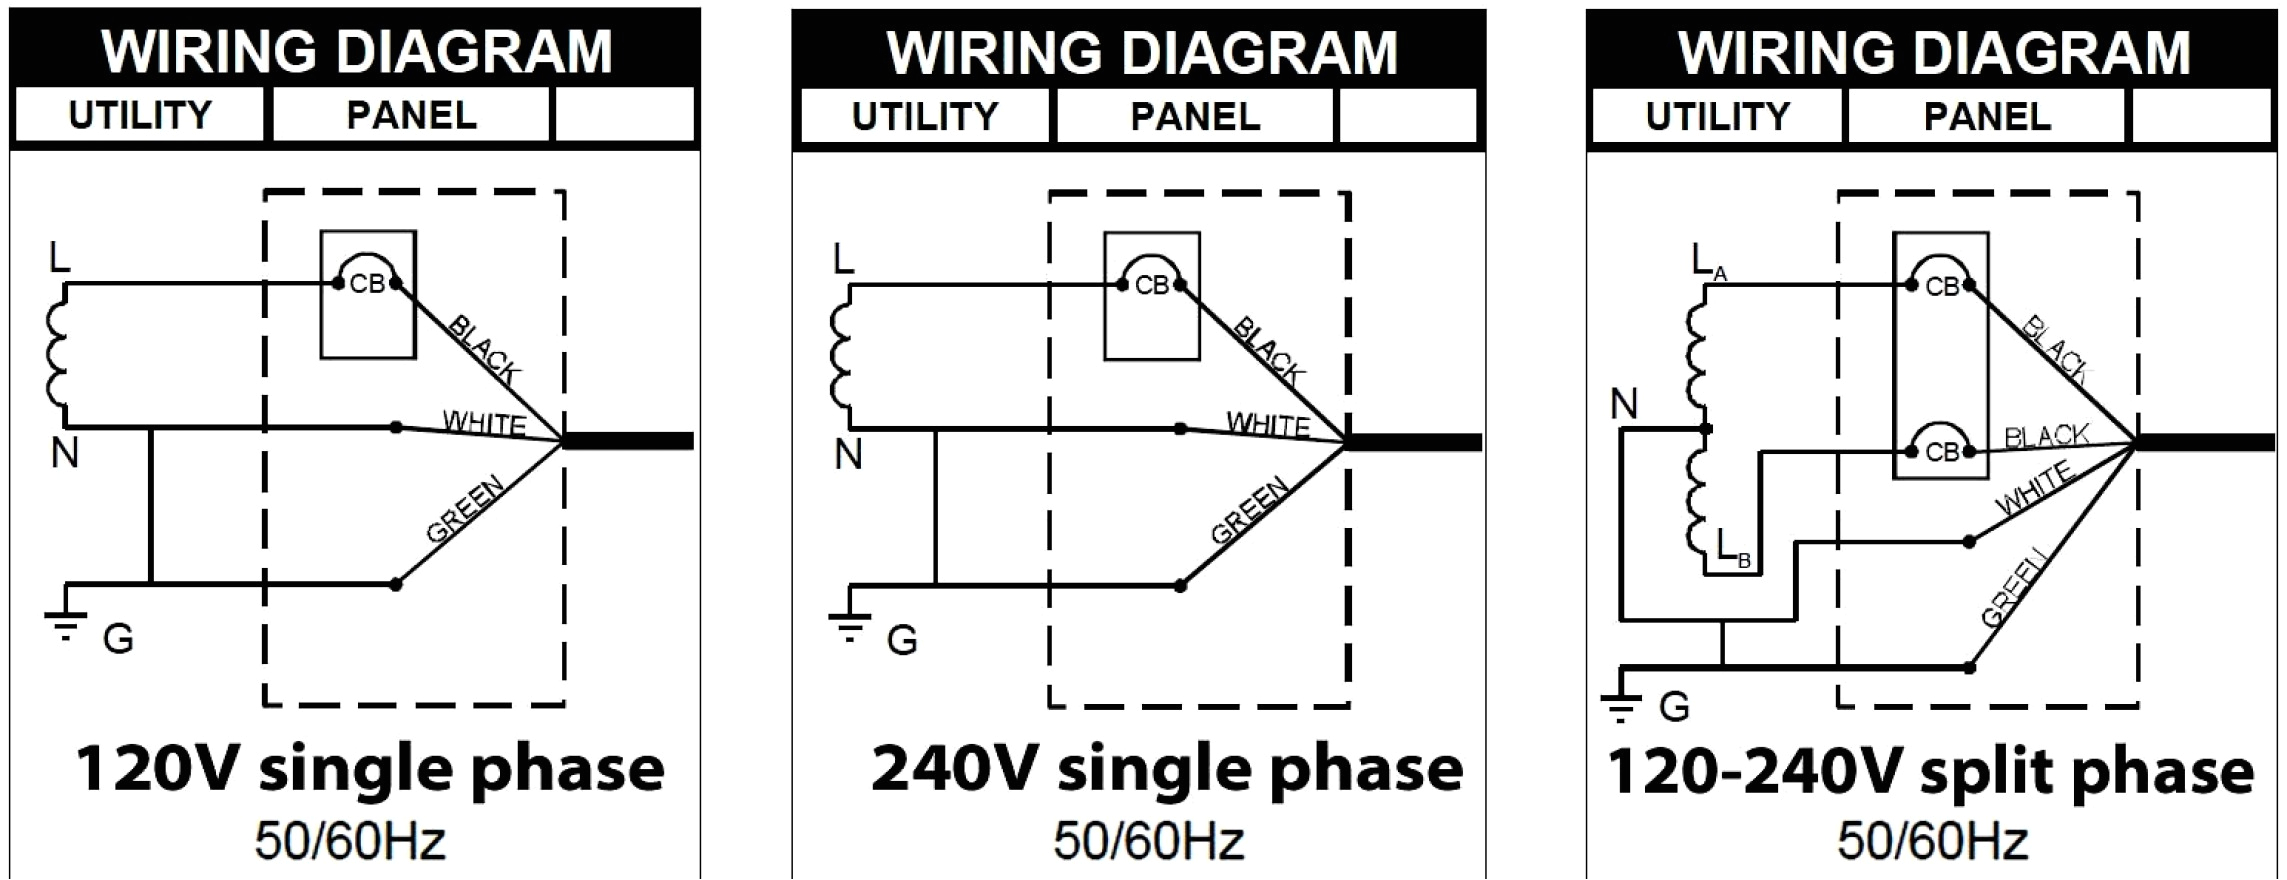 208v motor wiring diagram wiring diagram post208v wiring diagram 13